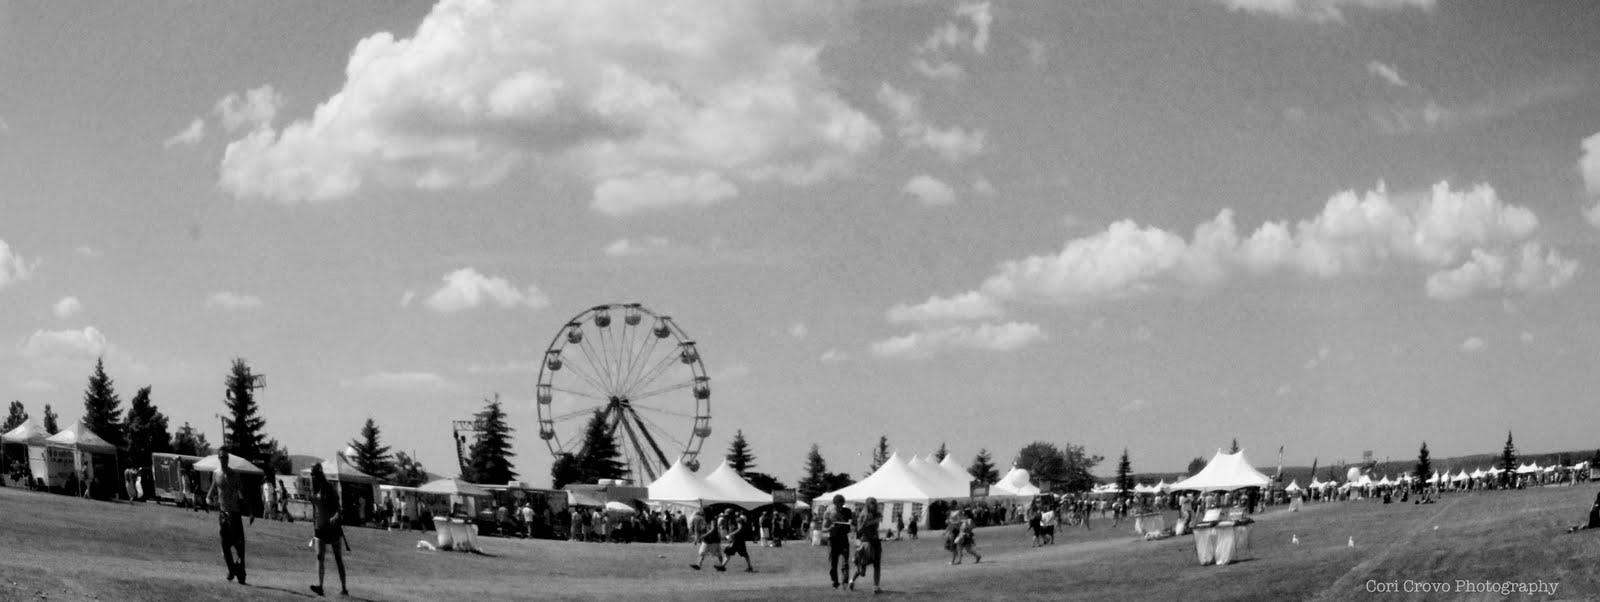 Whatalife Super Ball Ix A Three Day Festival